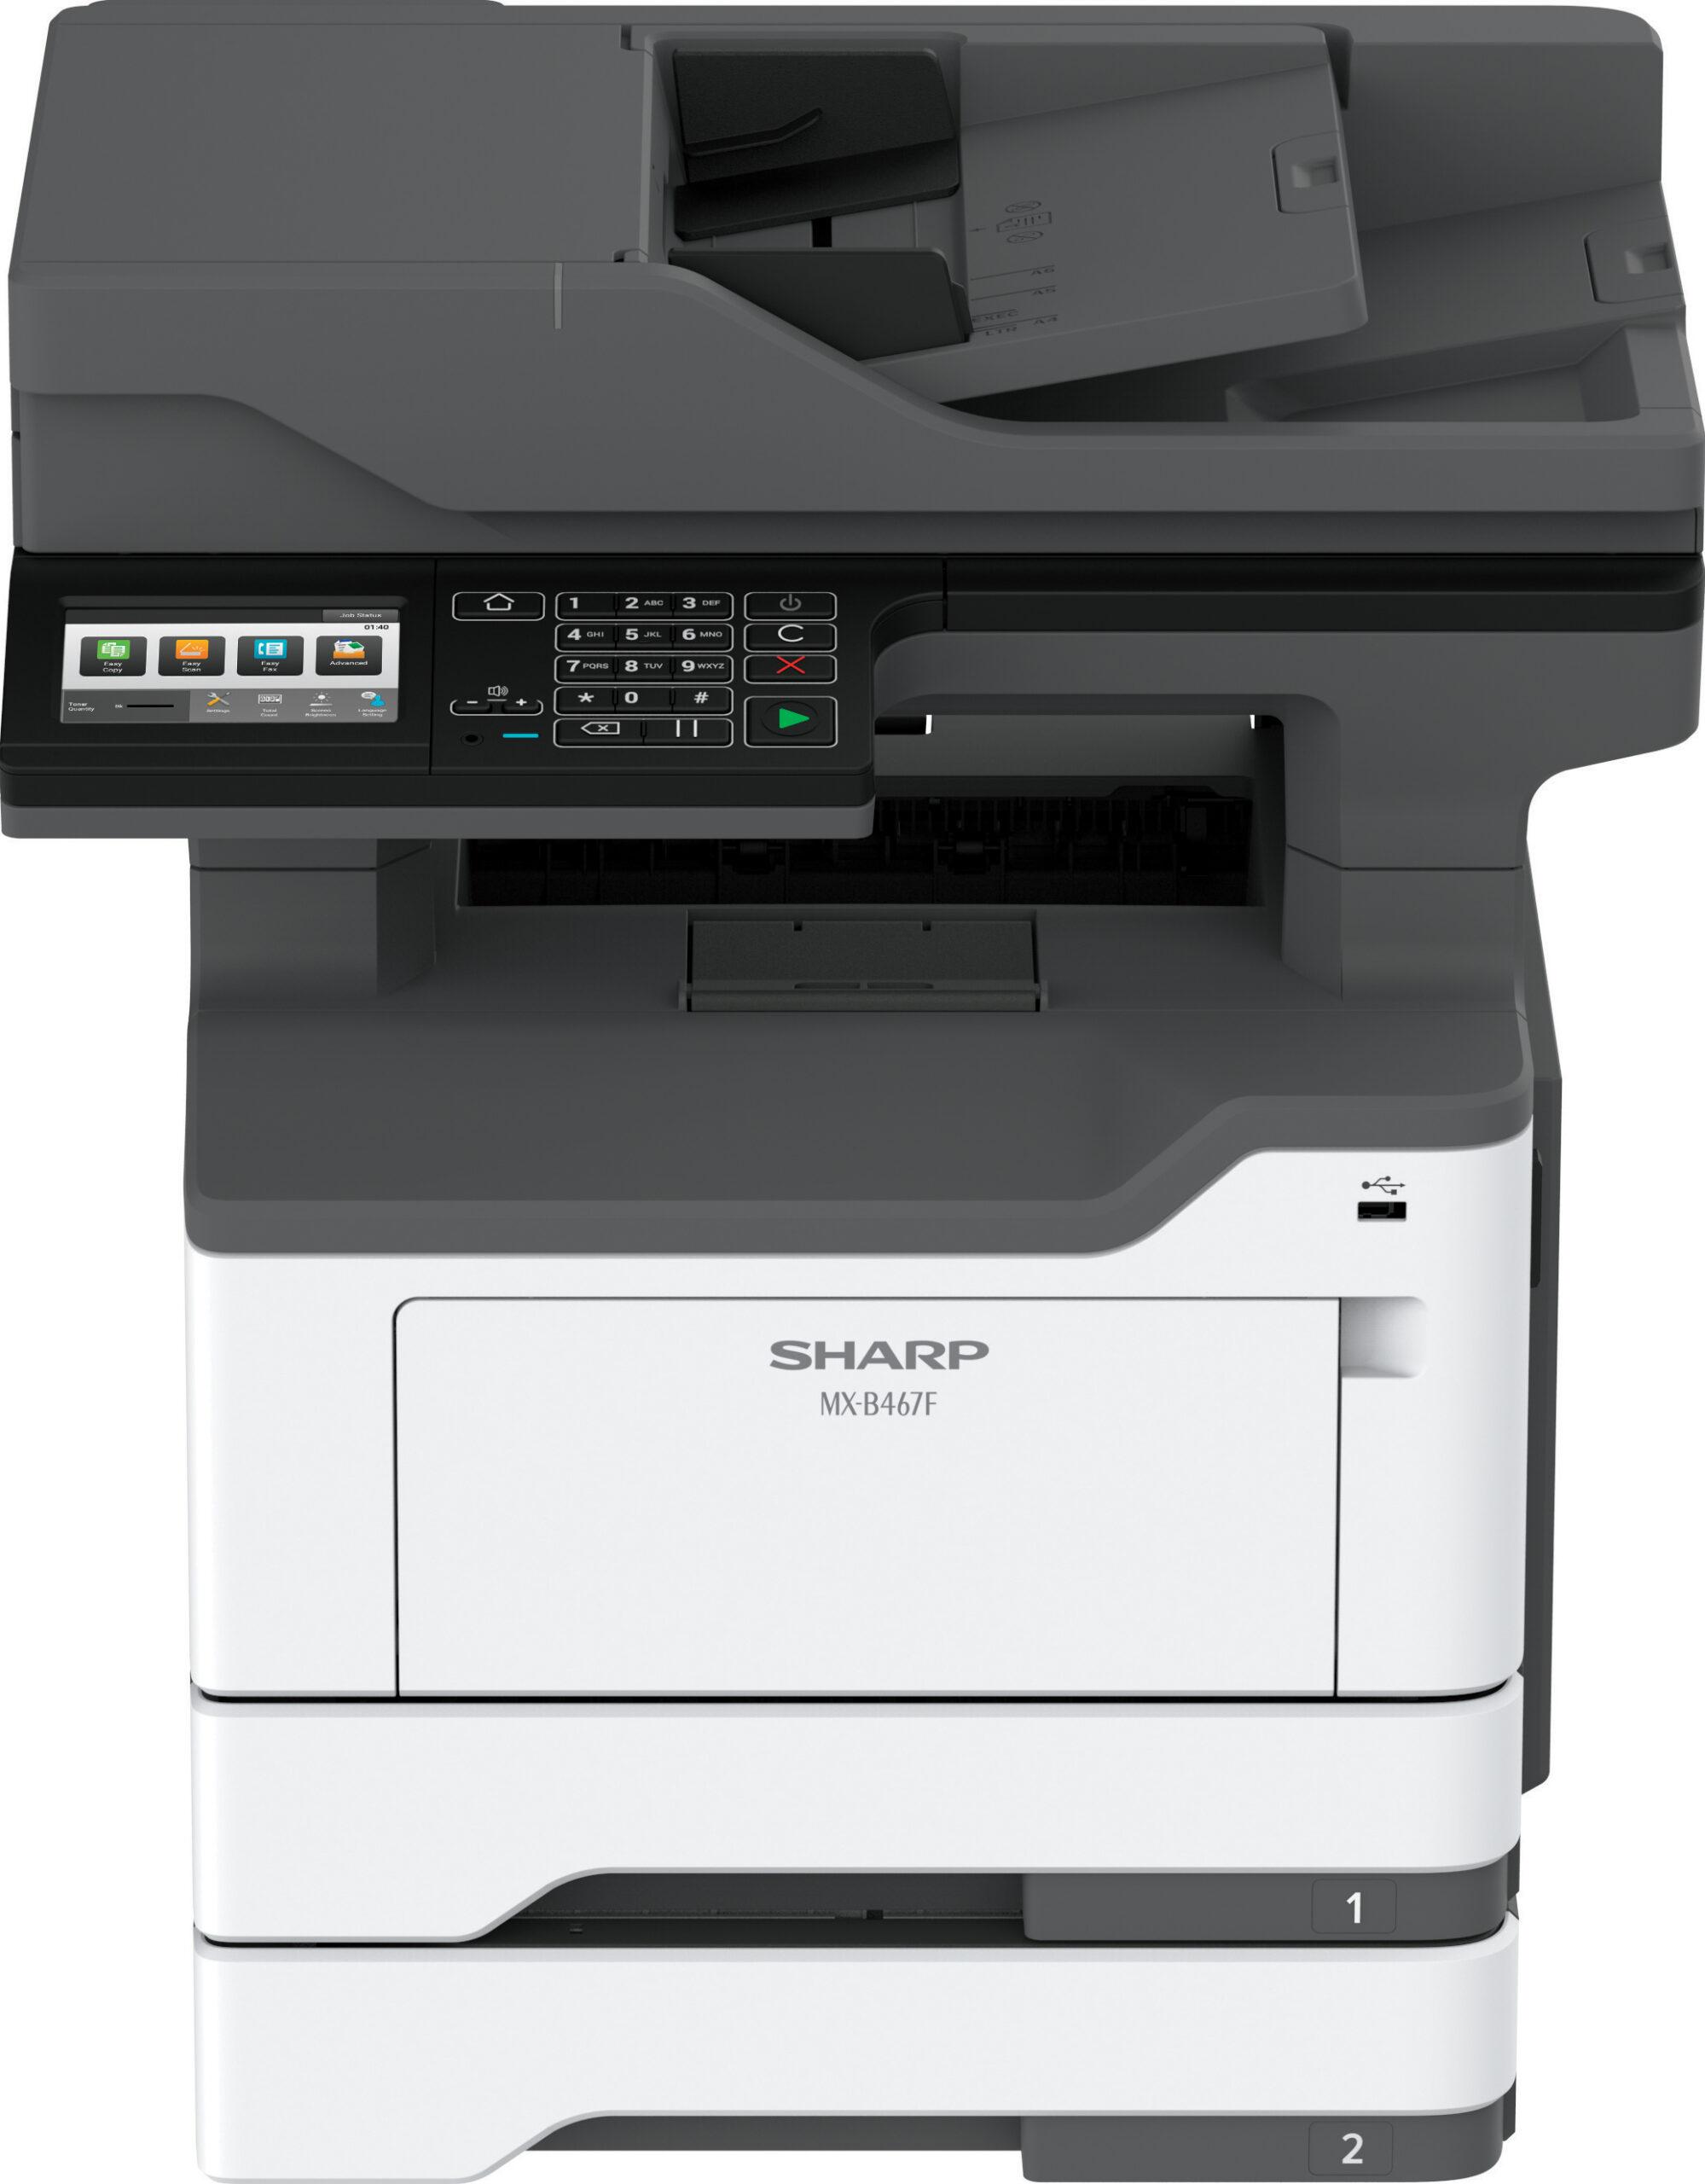 MX-B467F Image